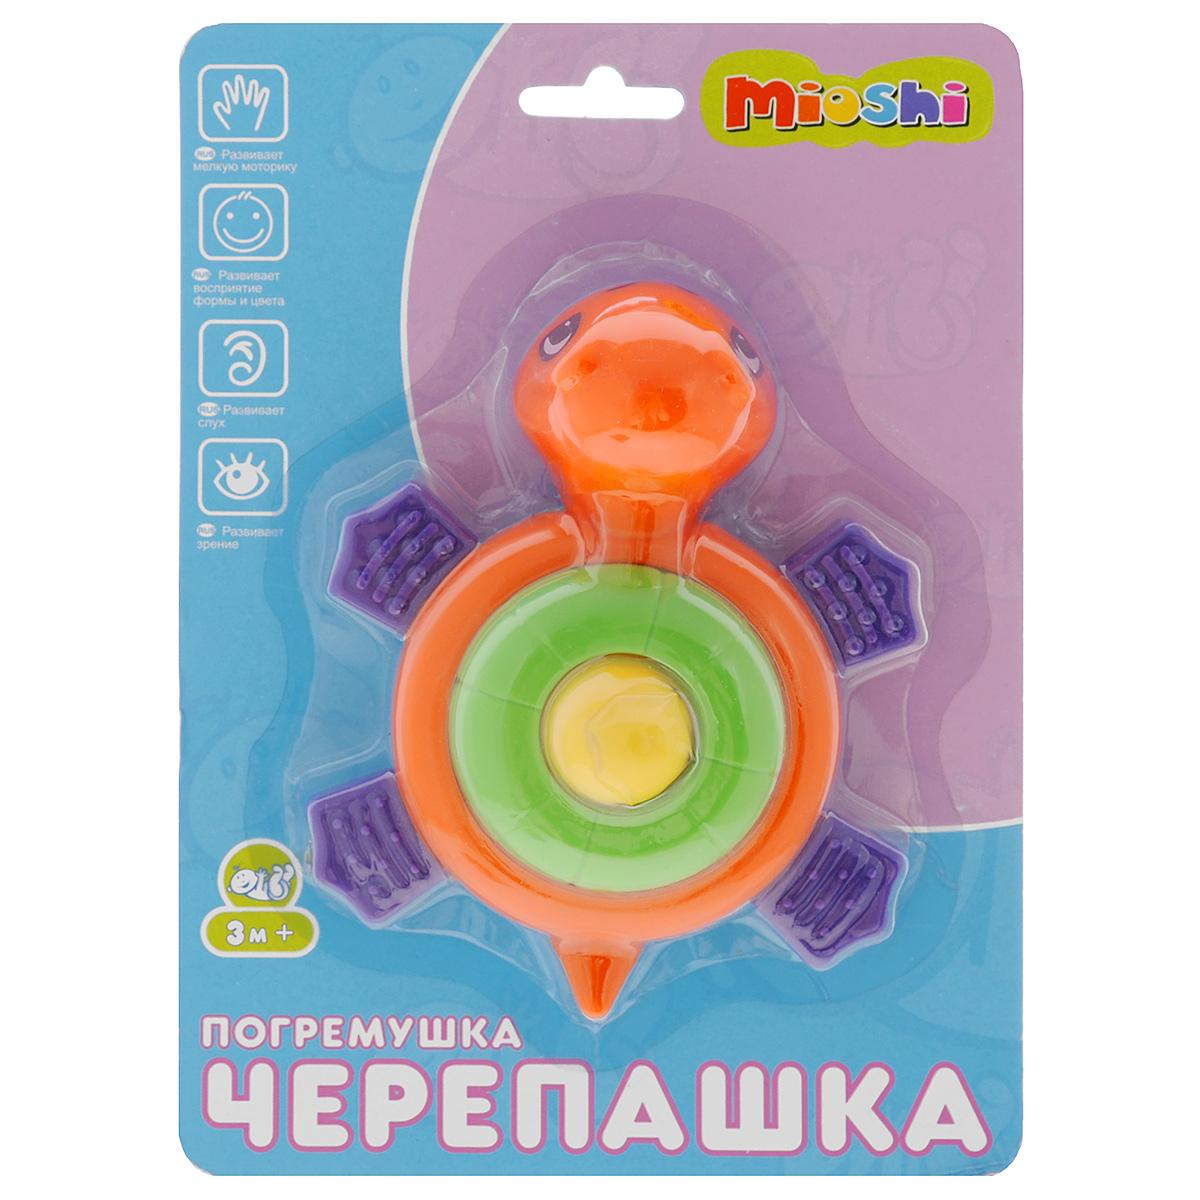 Развивающая игрушка-погремушка Mioshi Черепашка игрушка черепашка b kids